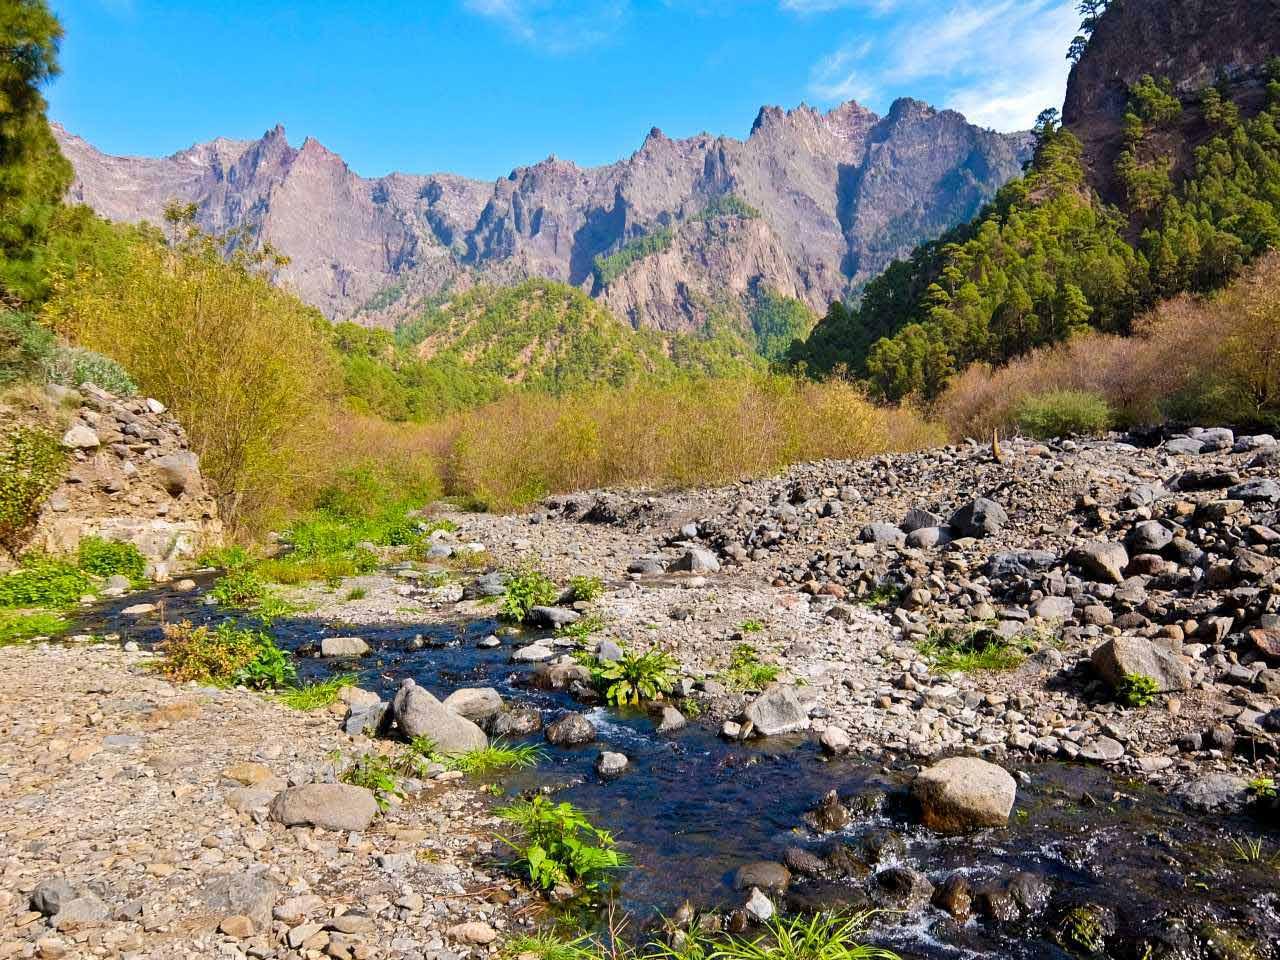 Barranco de las Angustias, La Palma